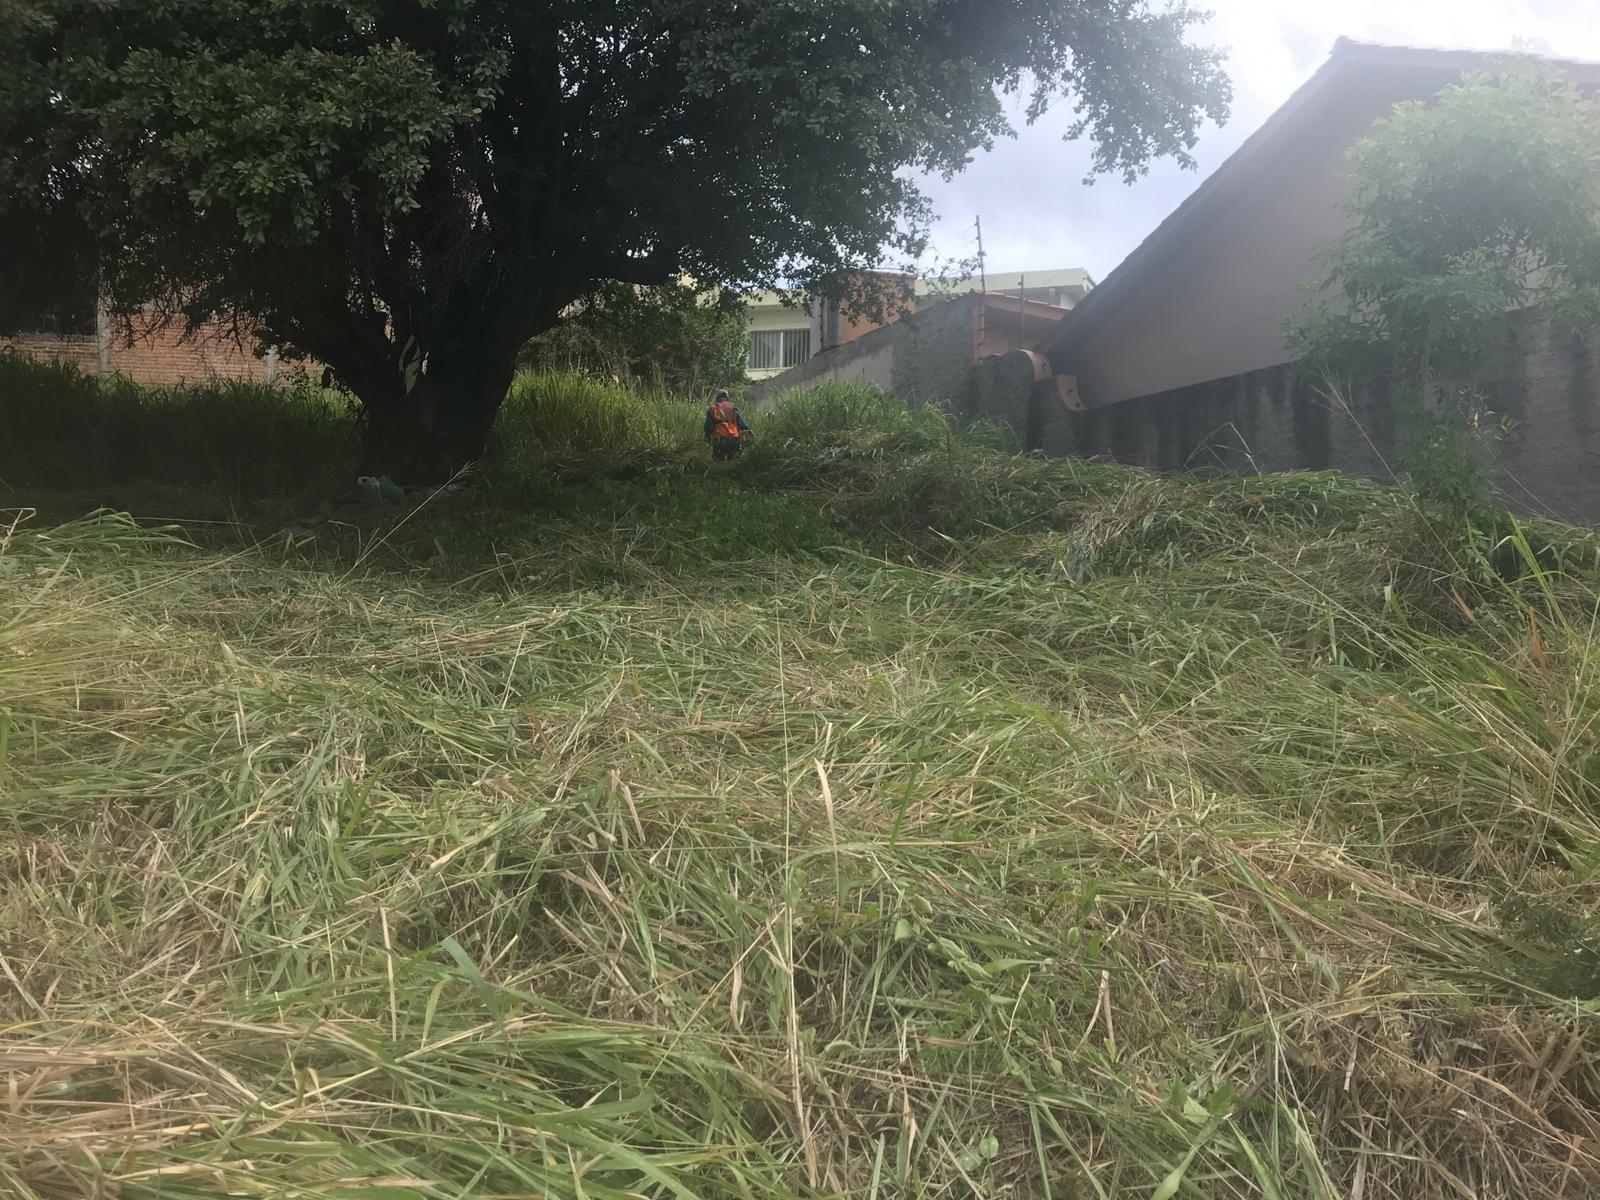 Autoridades determinaron que las personas dueñas de terrenos baldíos llenos de maleza serán multados.